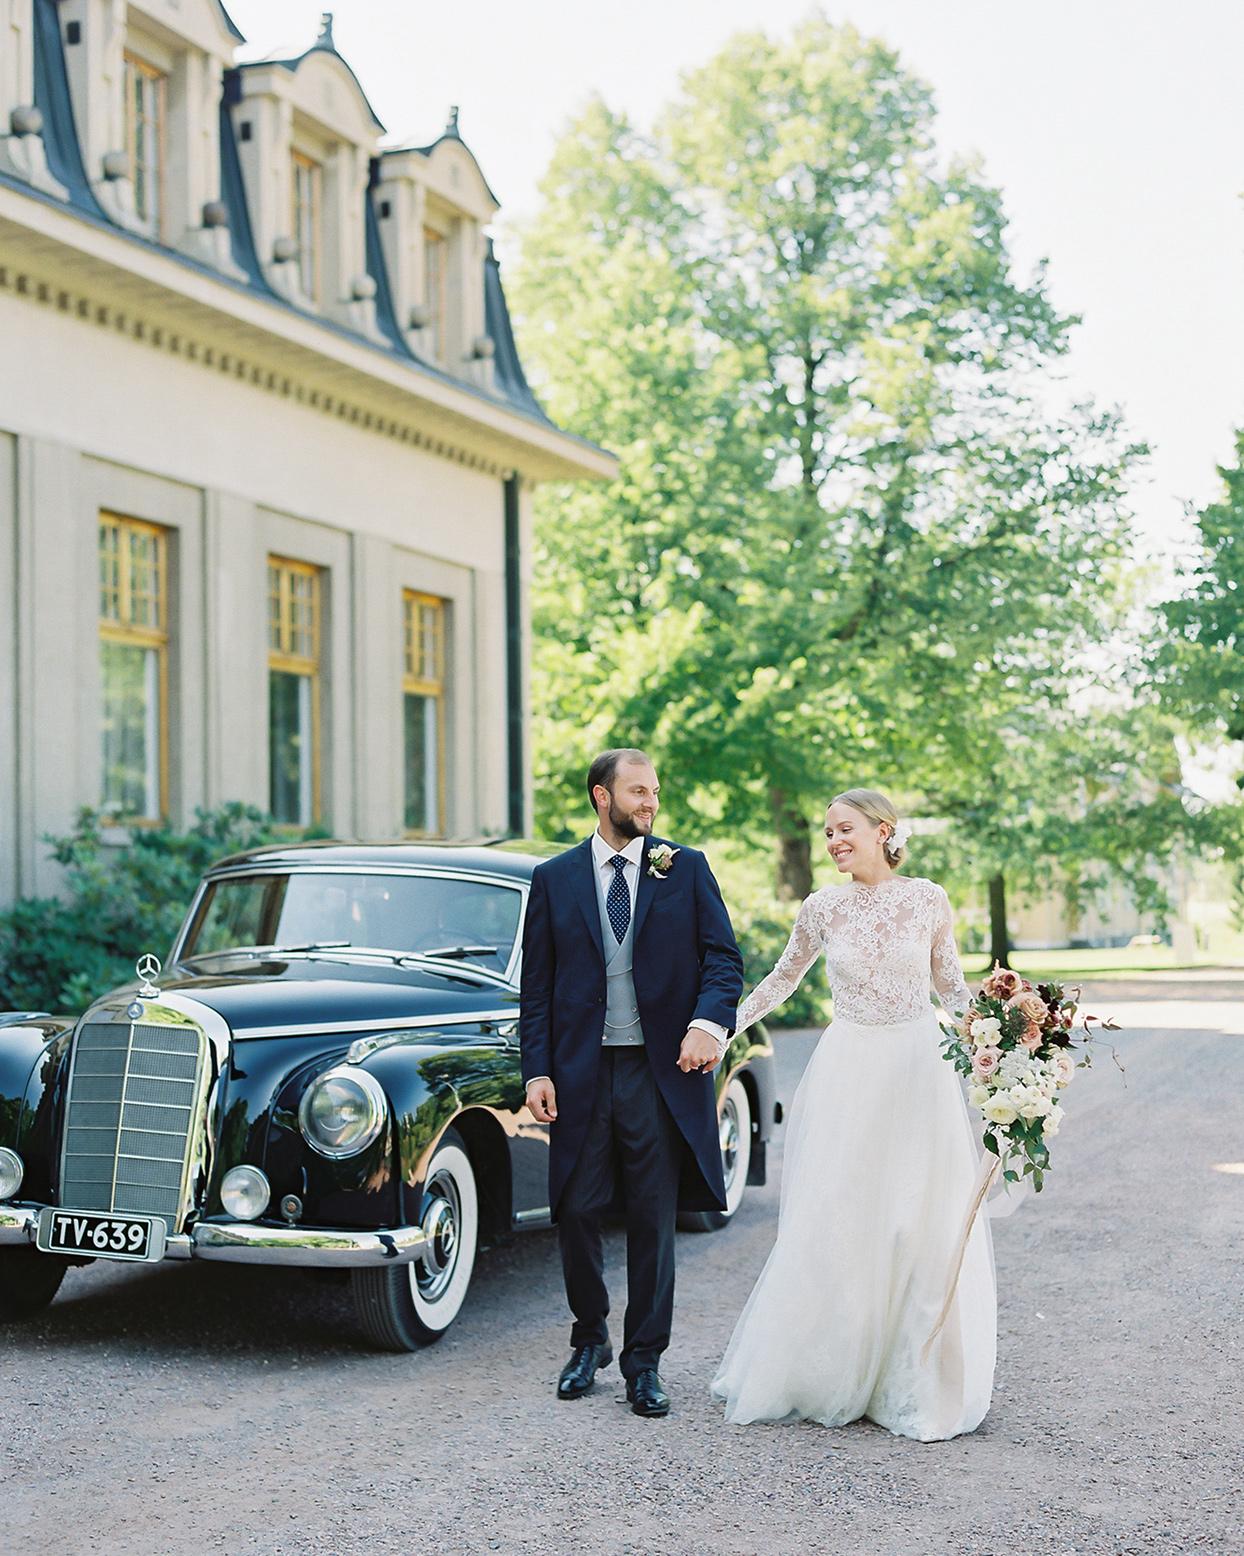 laura alexander couple walking by wedding car